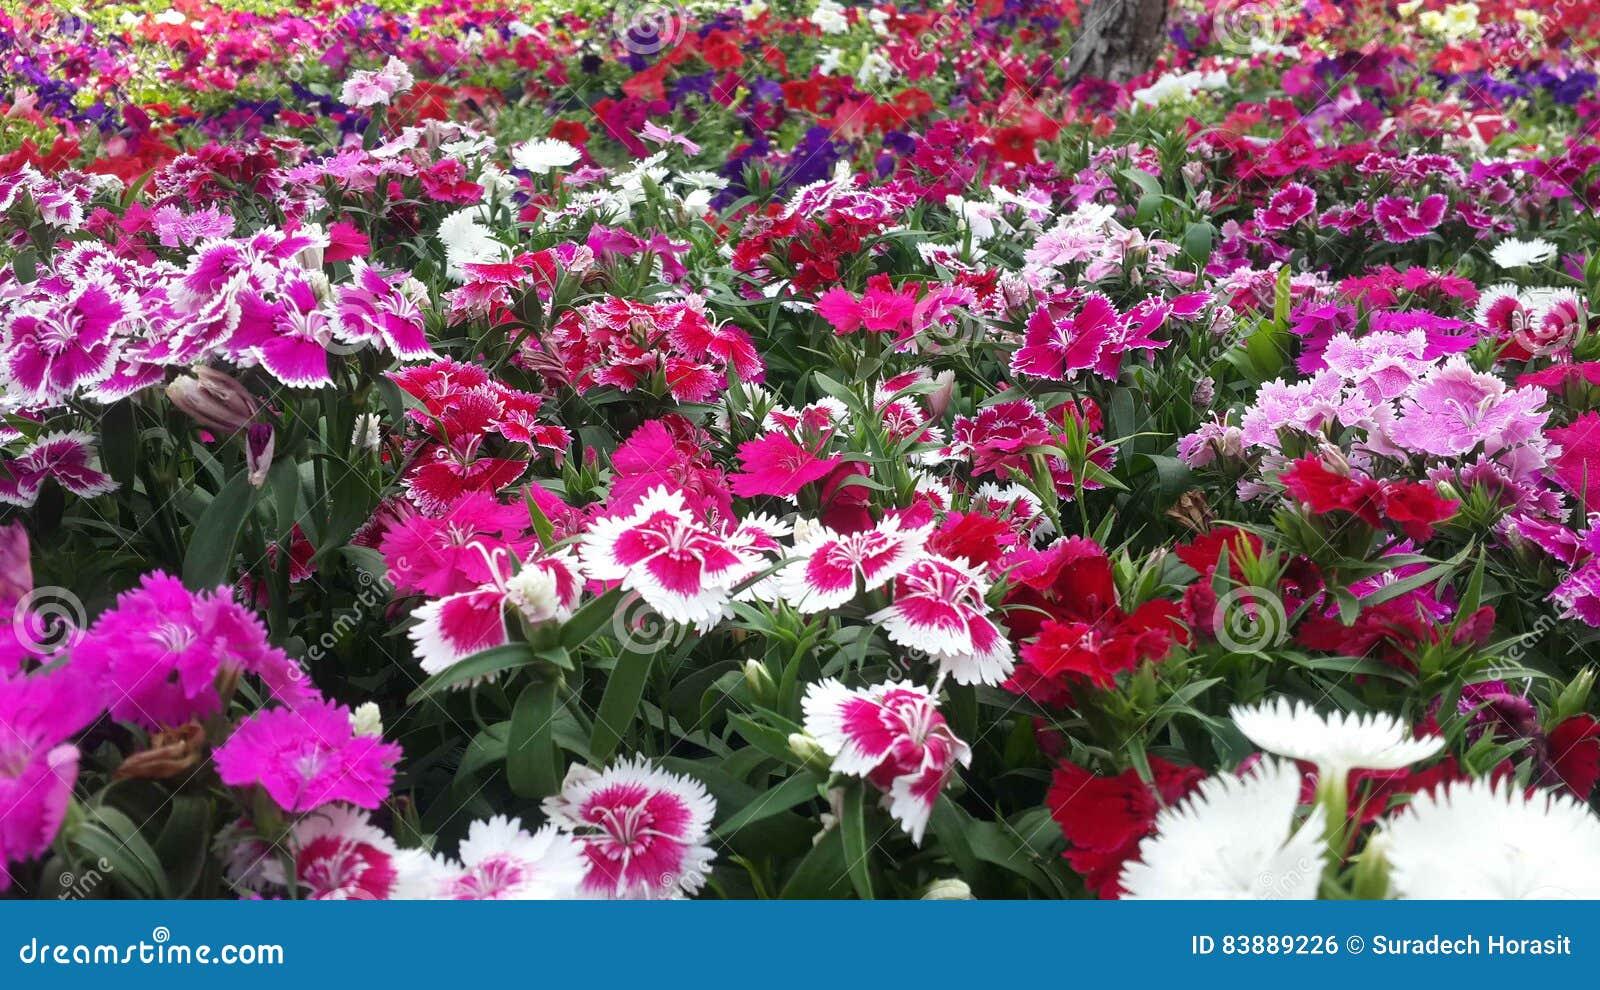 beautiful flowers in the garden under the winter sun stock photo